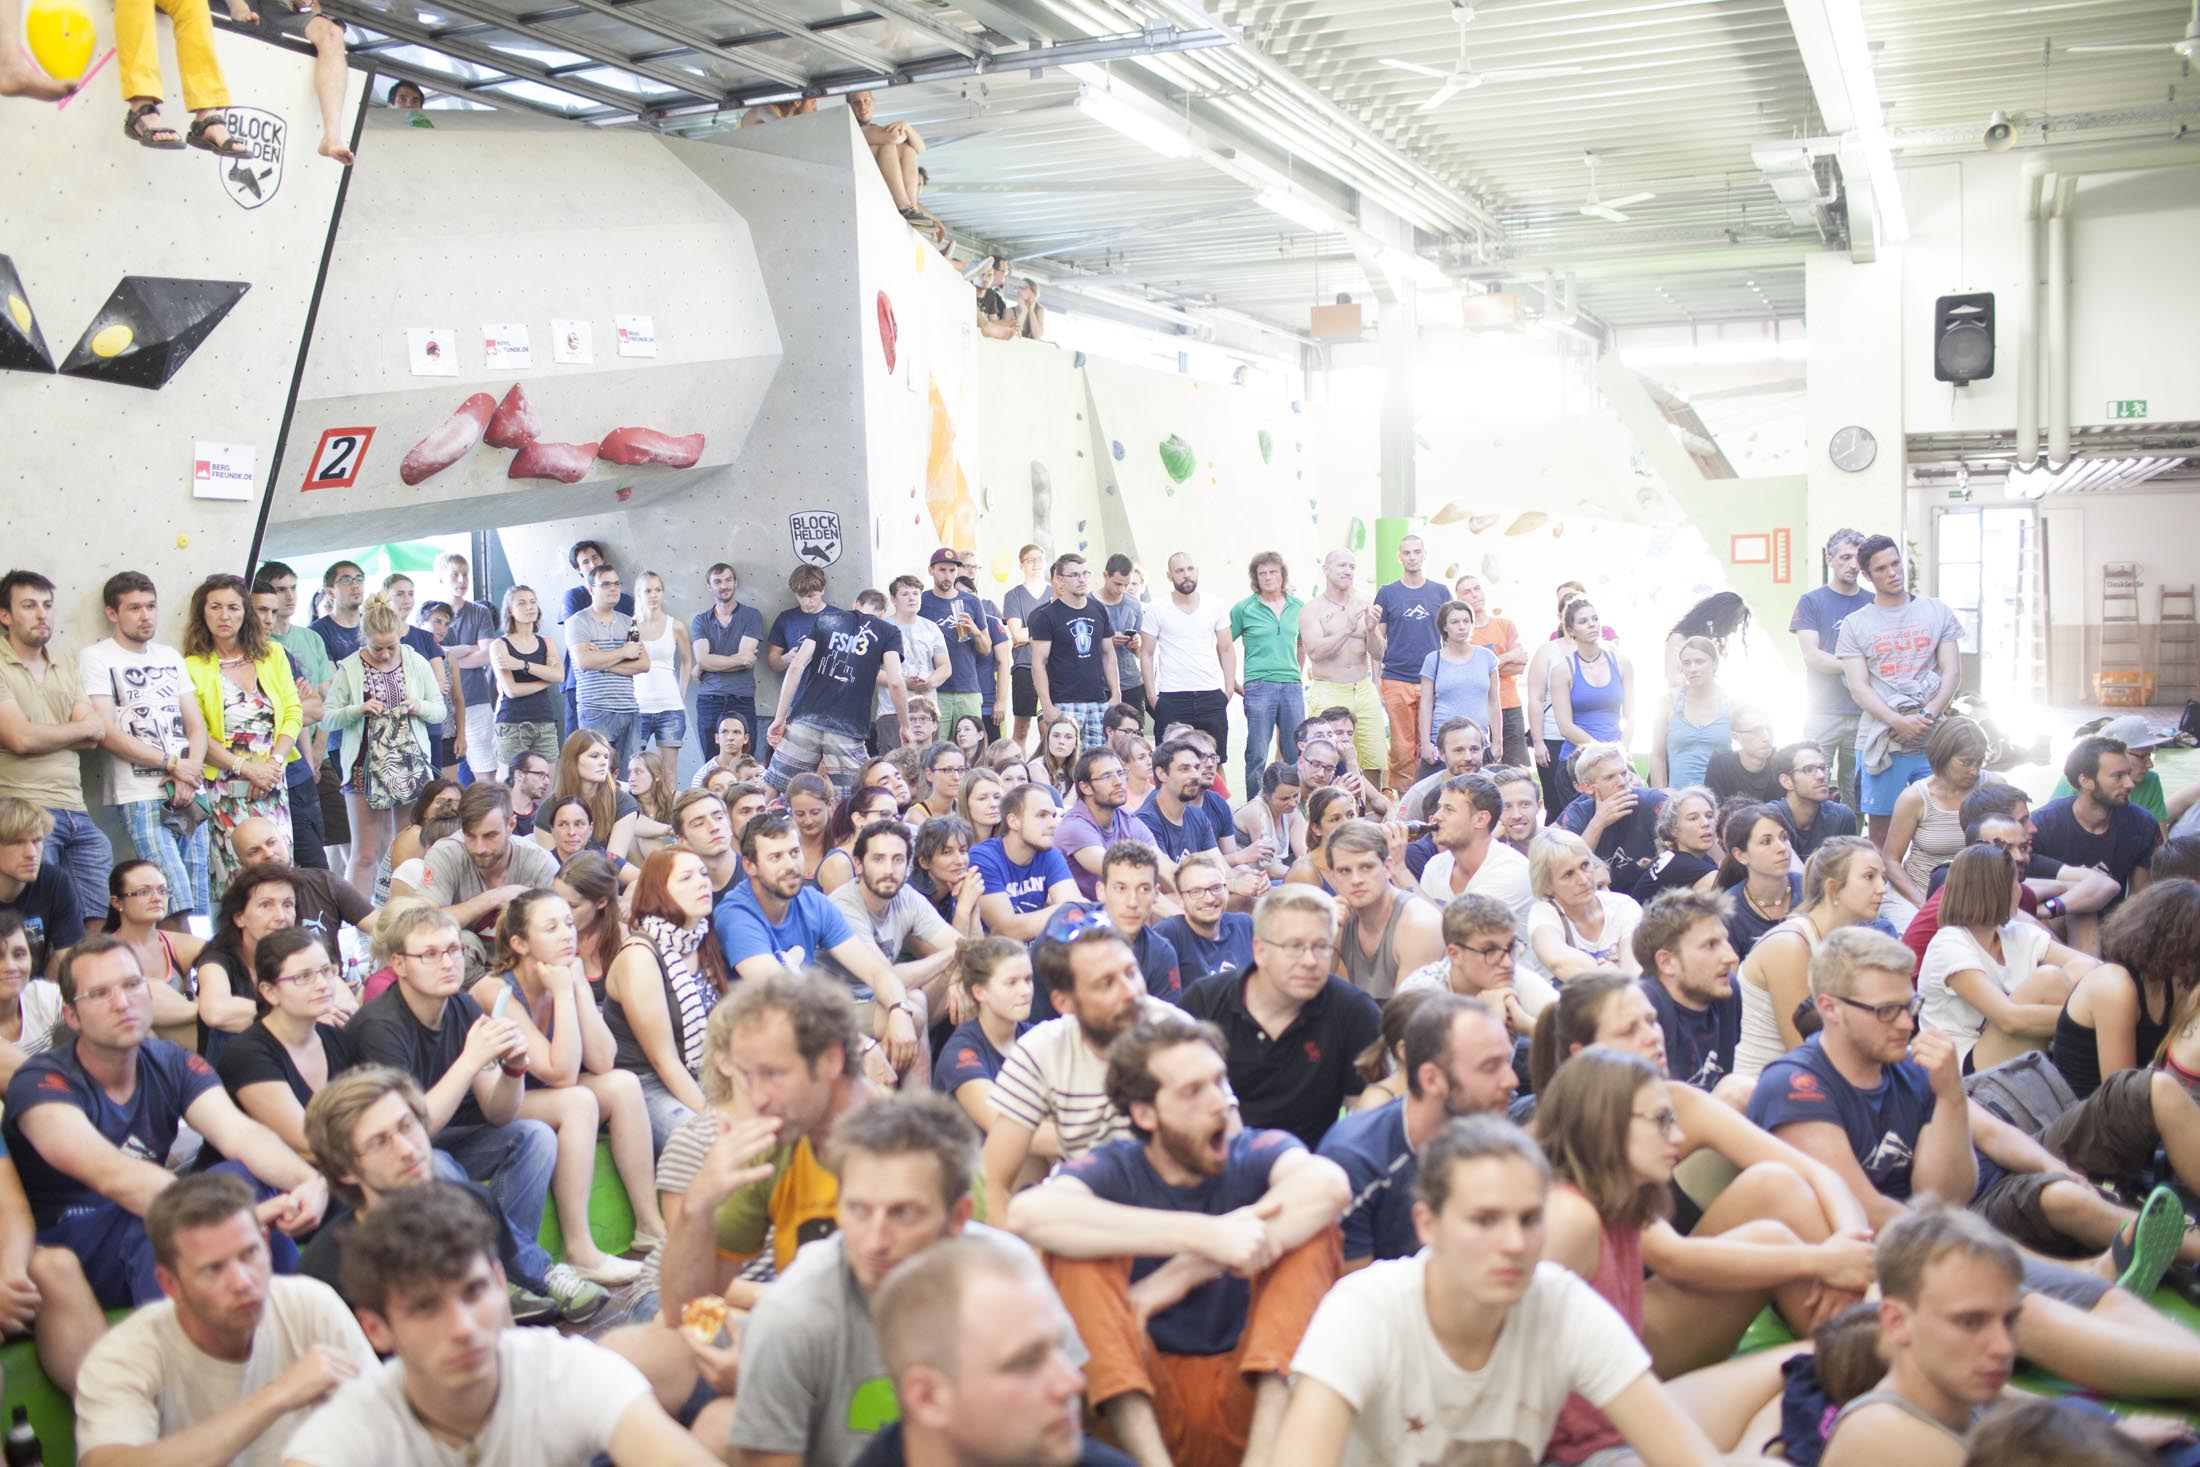 Finale, internationaler bouldercup Frankenjura 2016, BLOCKHELDEN Erlangen, Mammut, Bergfreunde.de, Boulderwettkampf07092016684